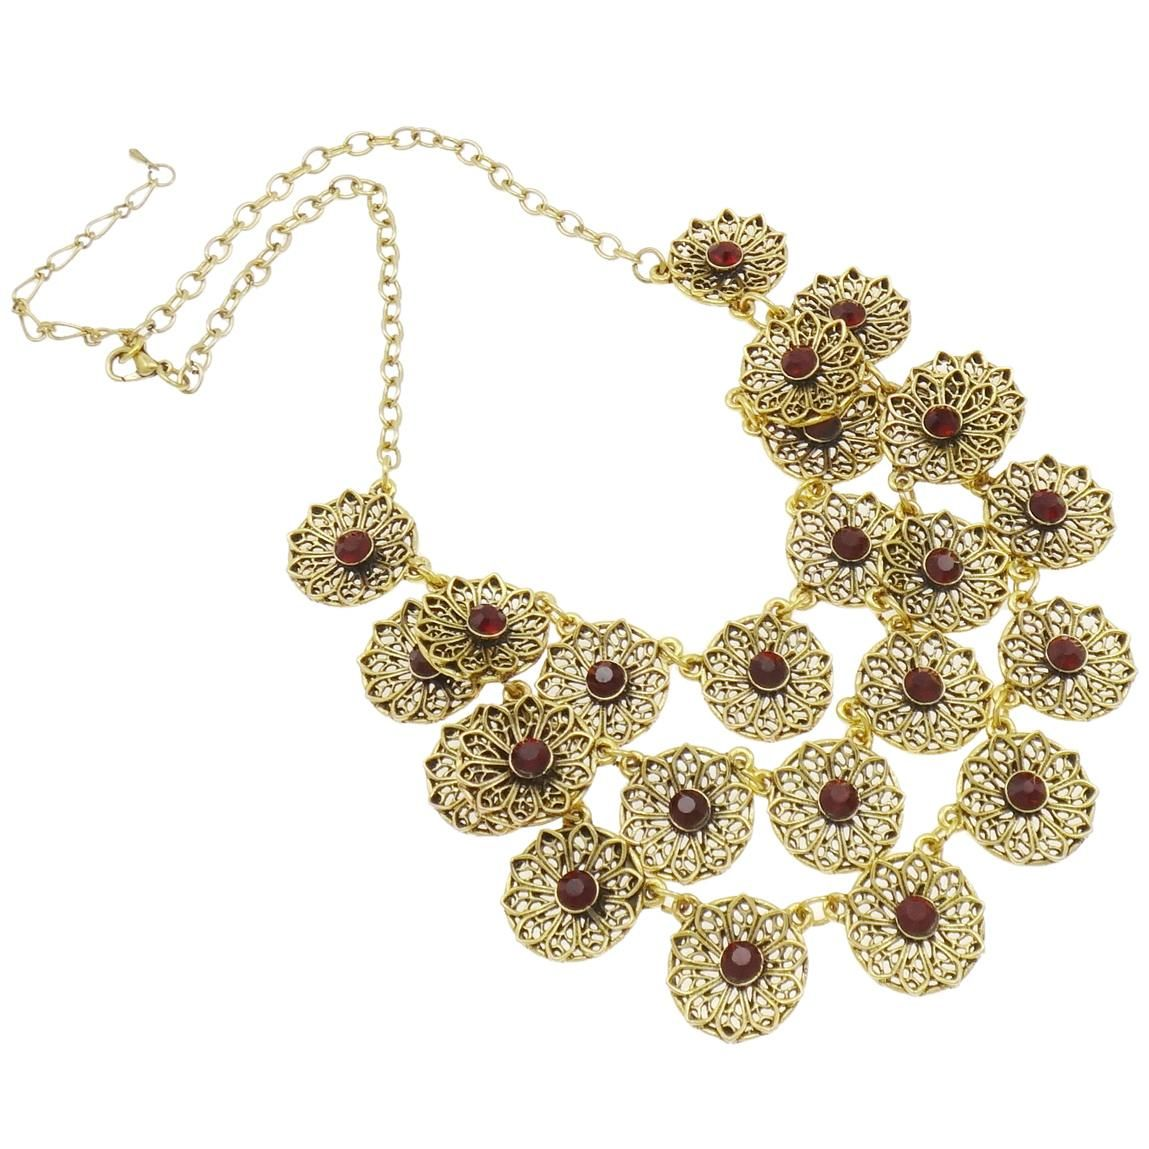 Gold Tone Victorian Revival Ruby Rhinestone Bib Necklace $24.00